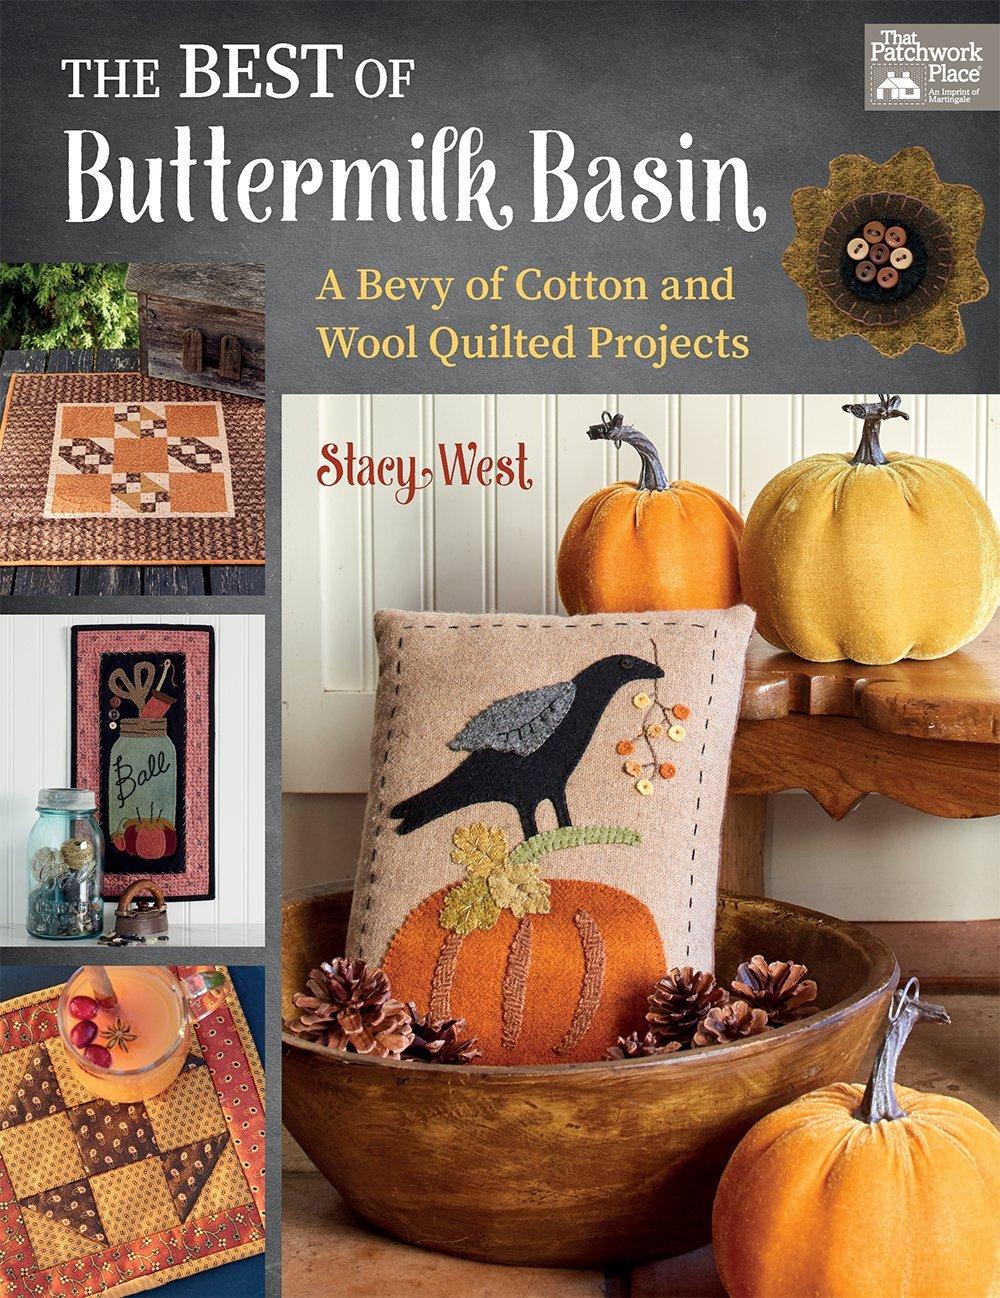 The Best of Buttermilk Basin